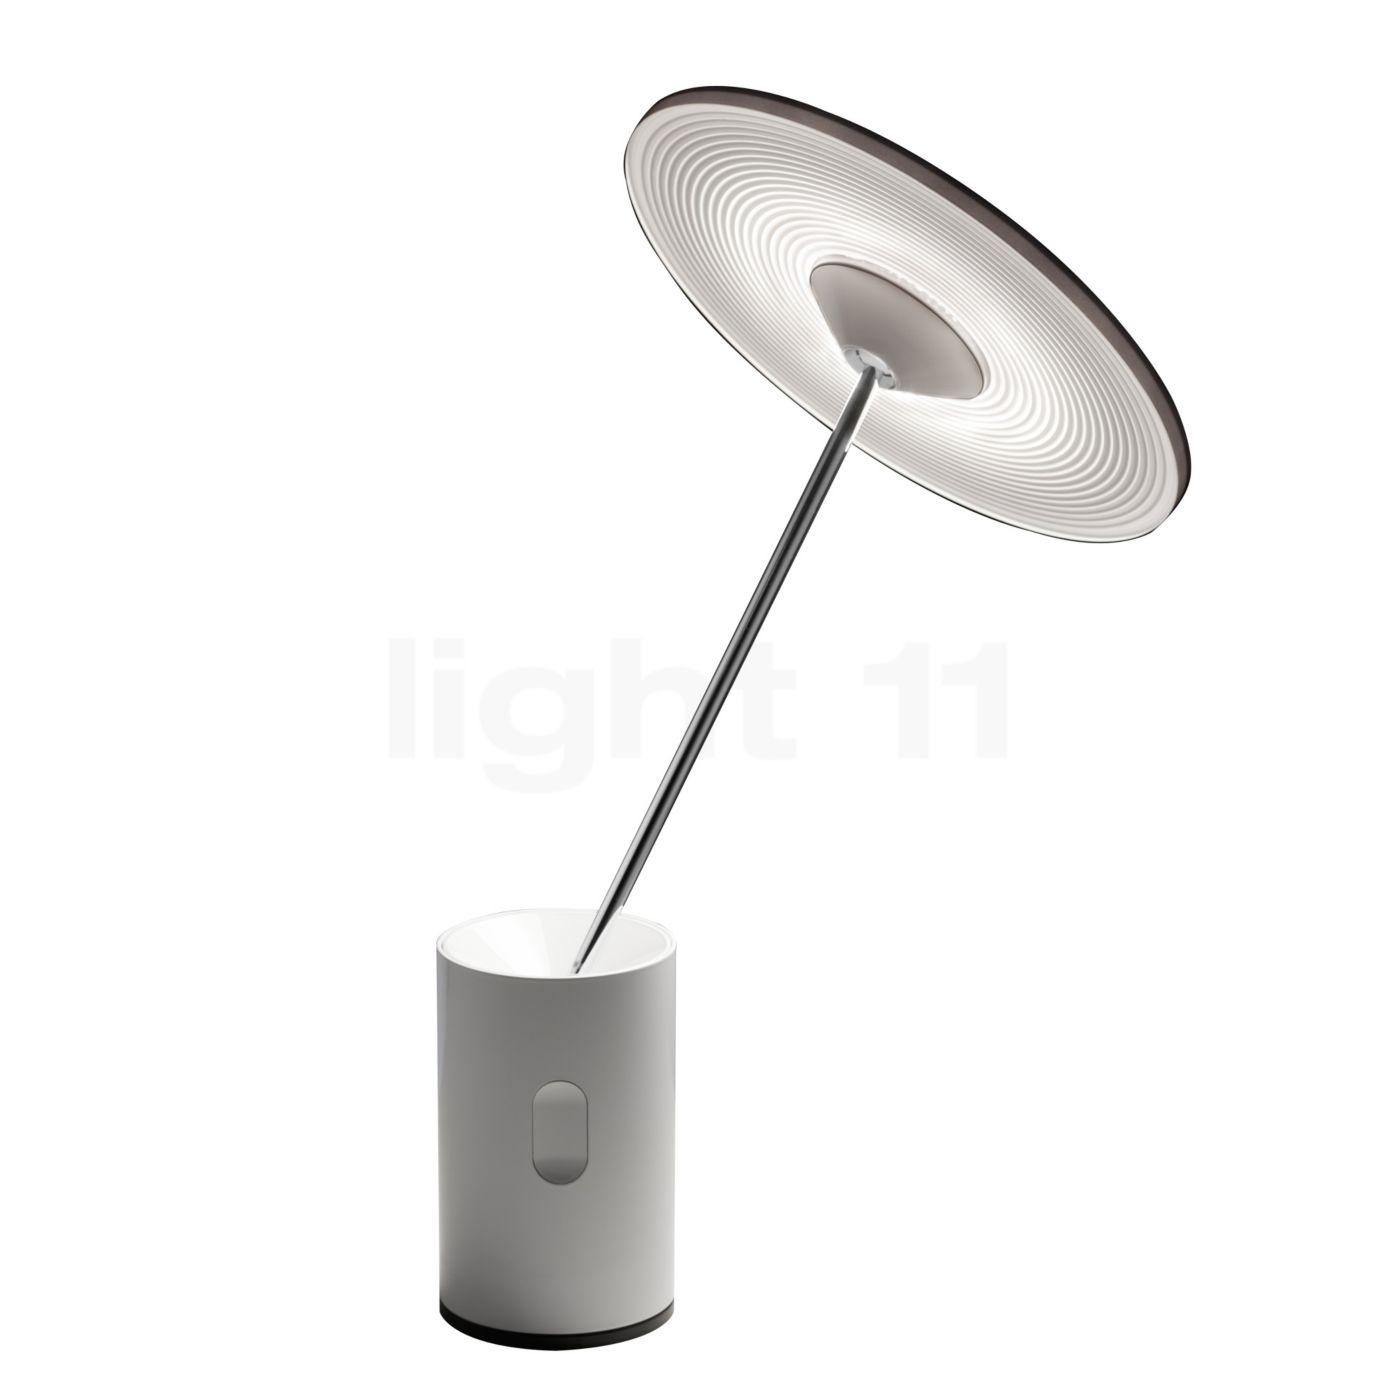 De Table Sisifo Led Lampe Artemide LUzMGqSVjp